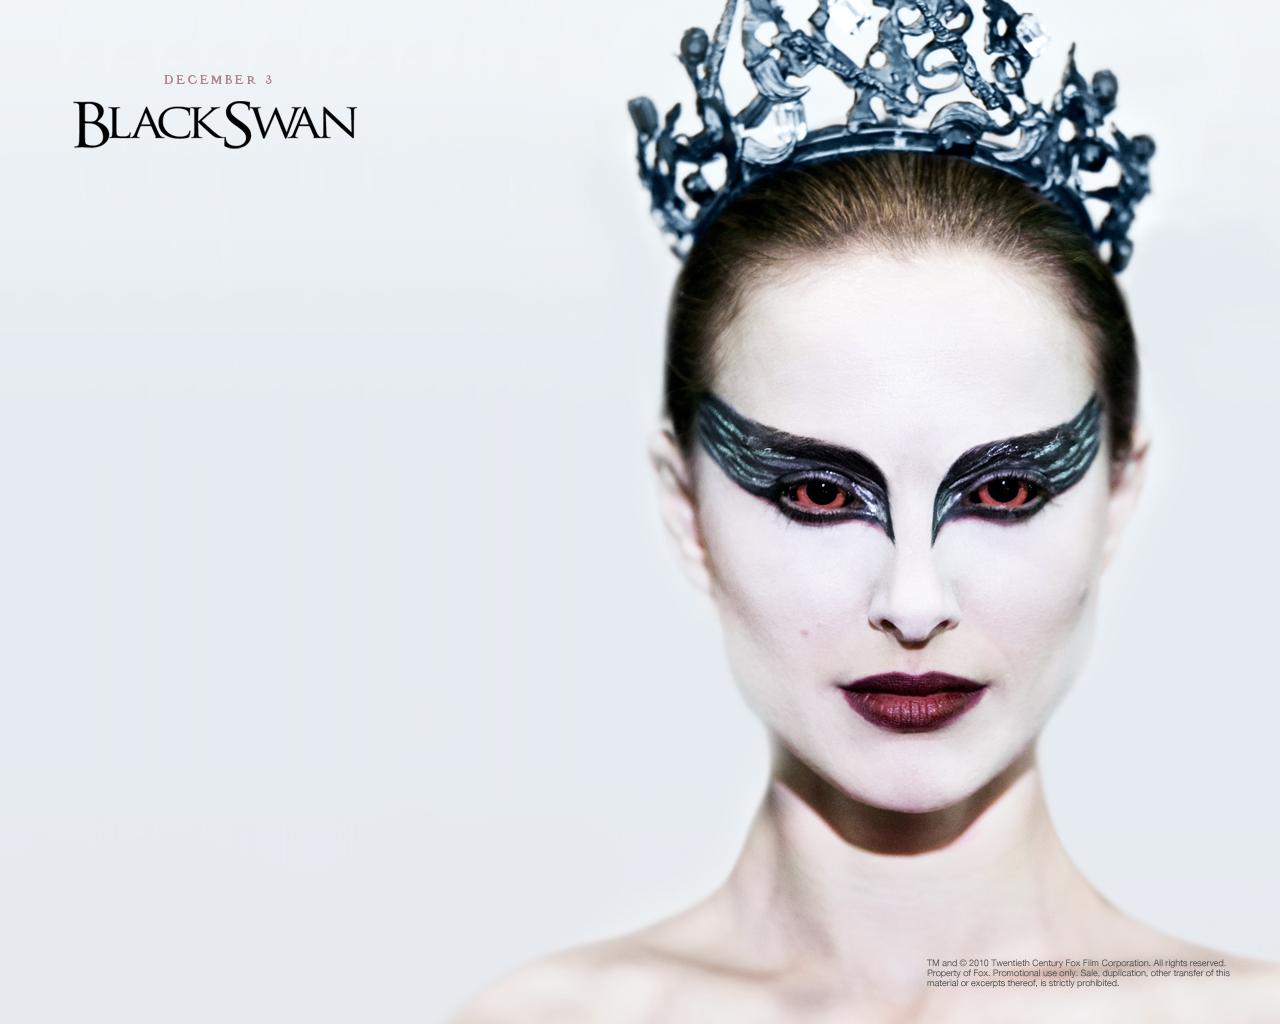 black swan wallpapers 12 58 black swan cinema cisne negro wallpapers 1280x1024